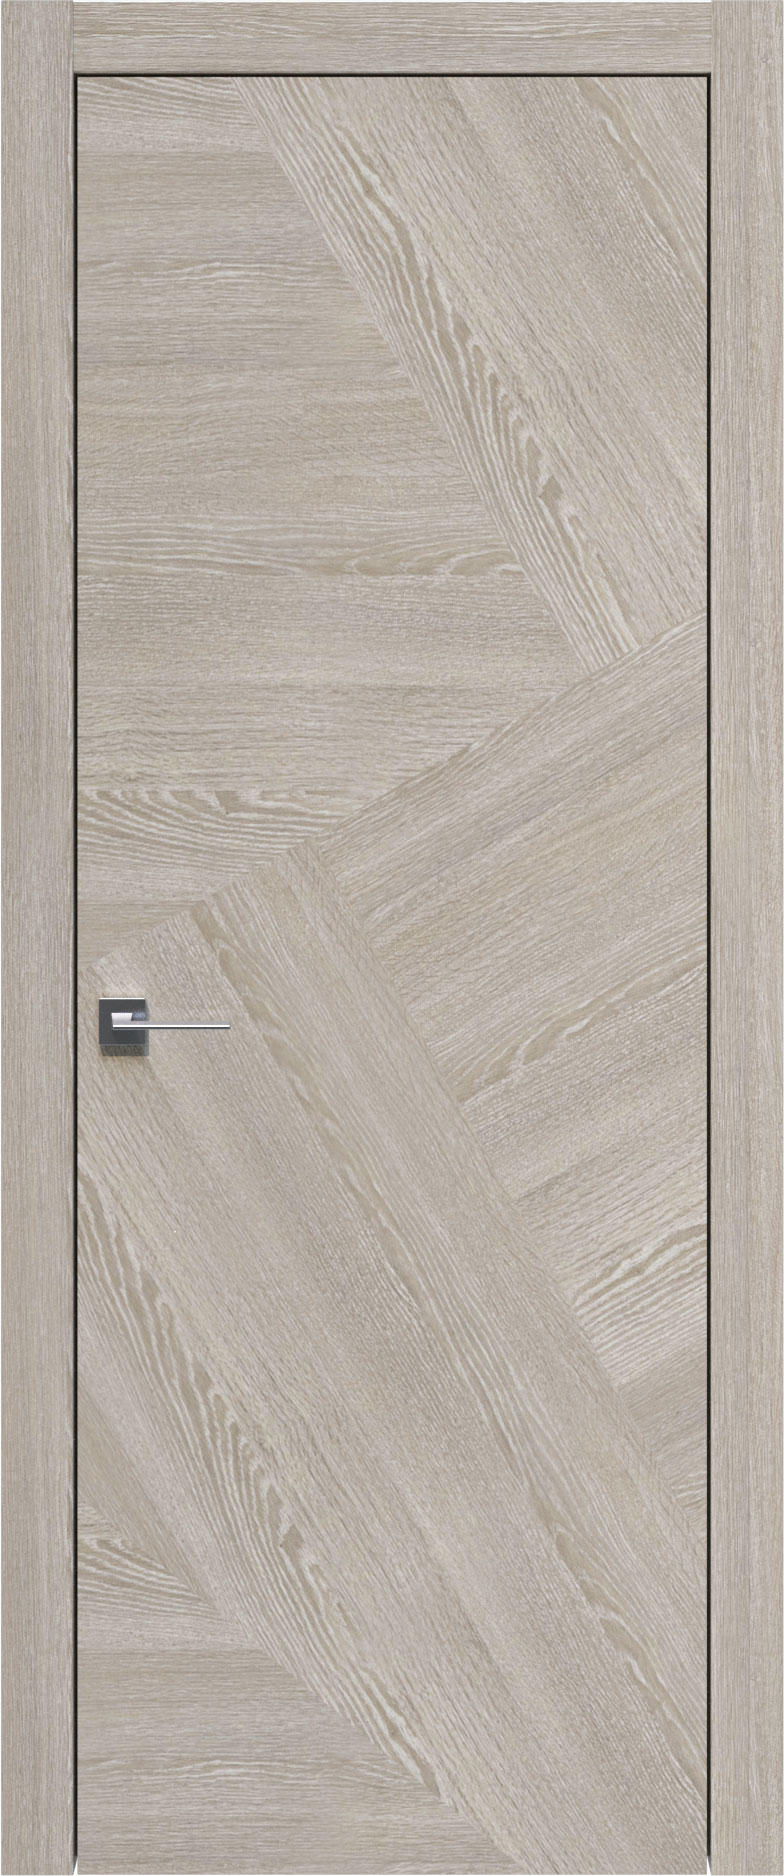 Tivoli М-1 цвет - Серый дуб Без стекла (ДГ)